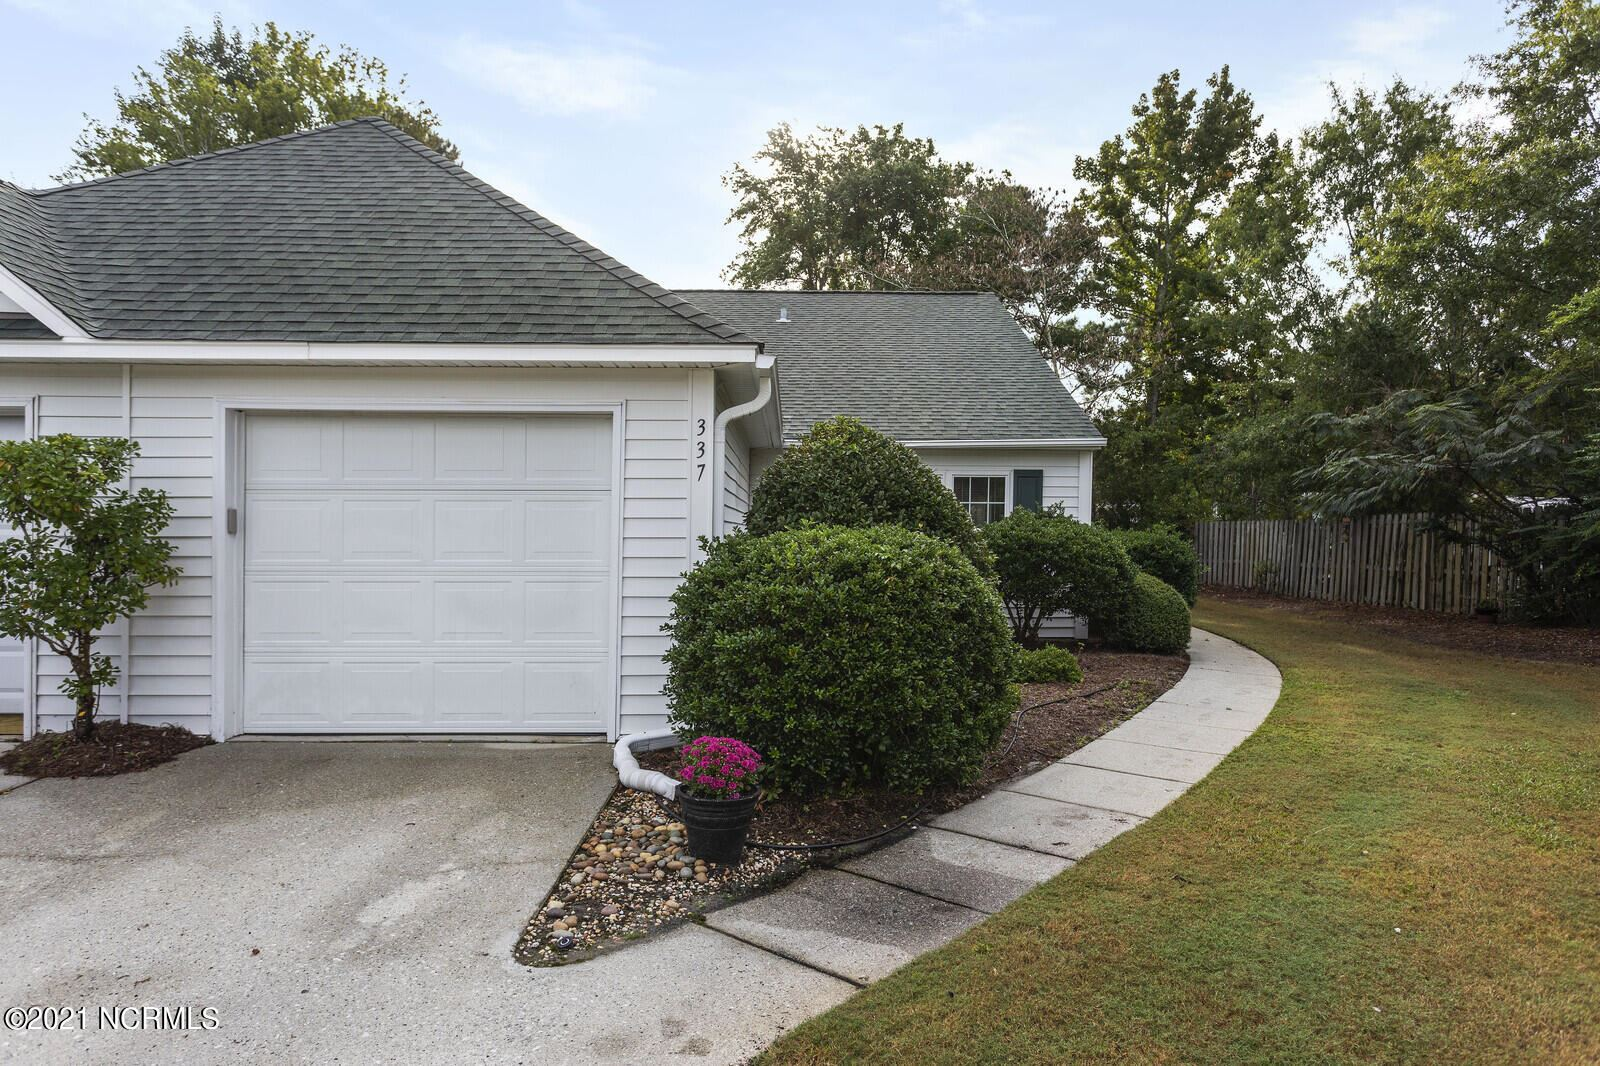 Photo of 337 Emerald Cove Court, Wilmington, NC 28409 (MLS # 100294567)